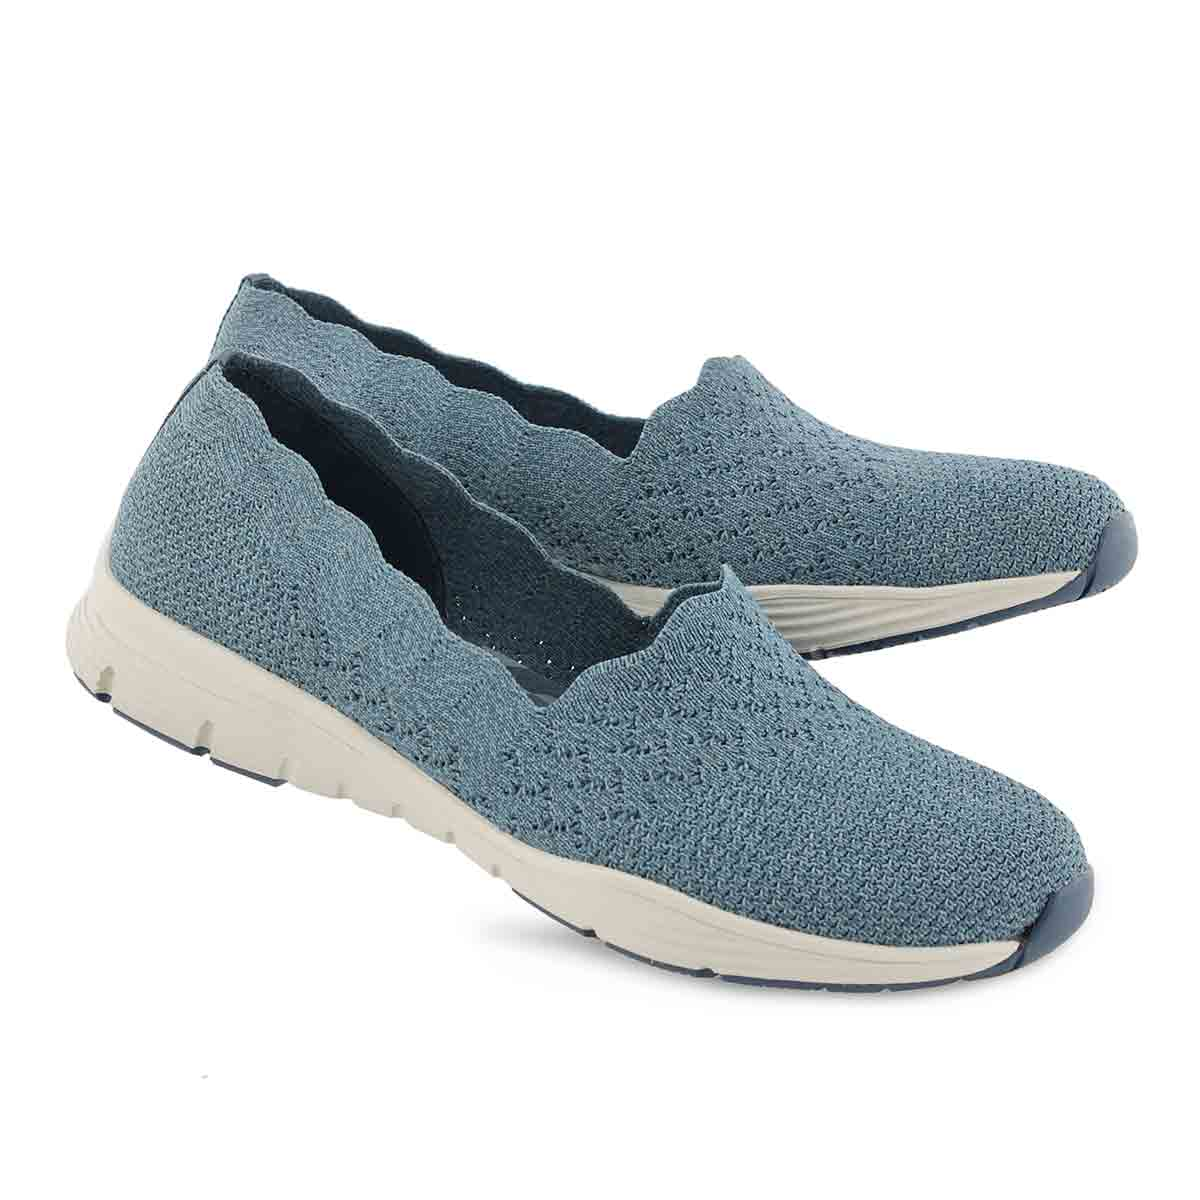 Women's SEAGER STAT denim slip on shoes